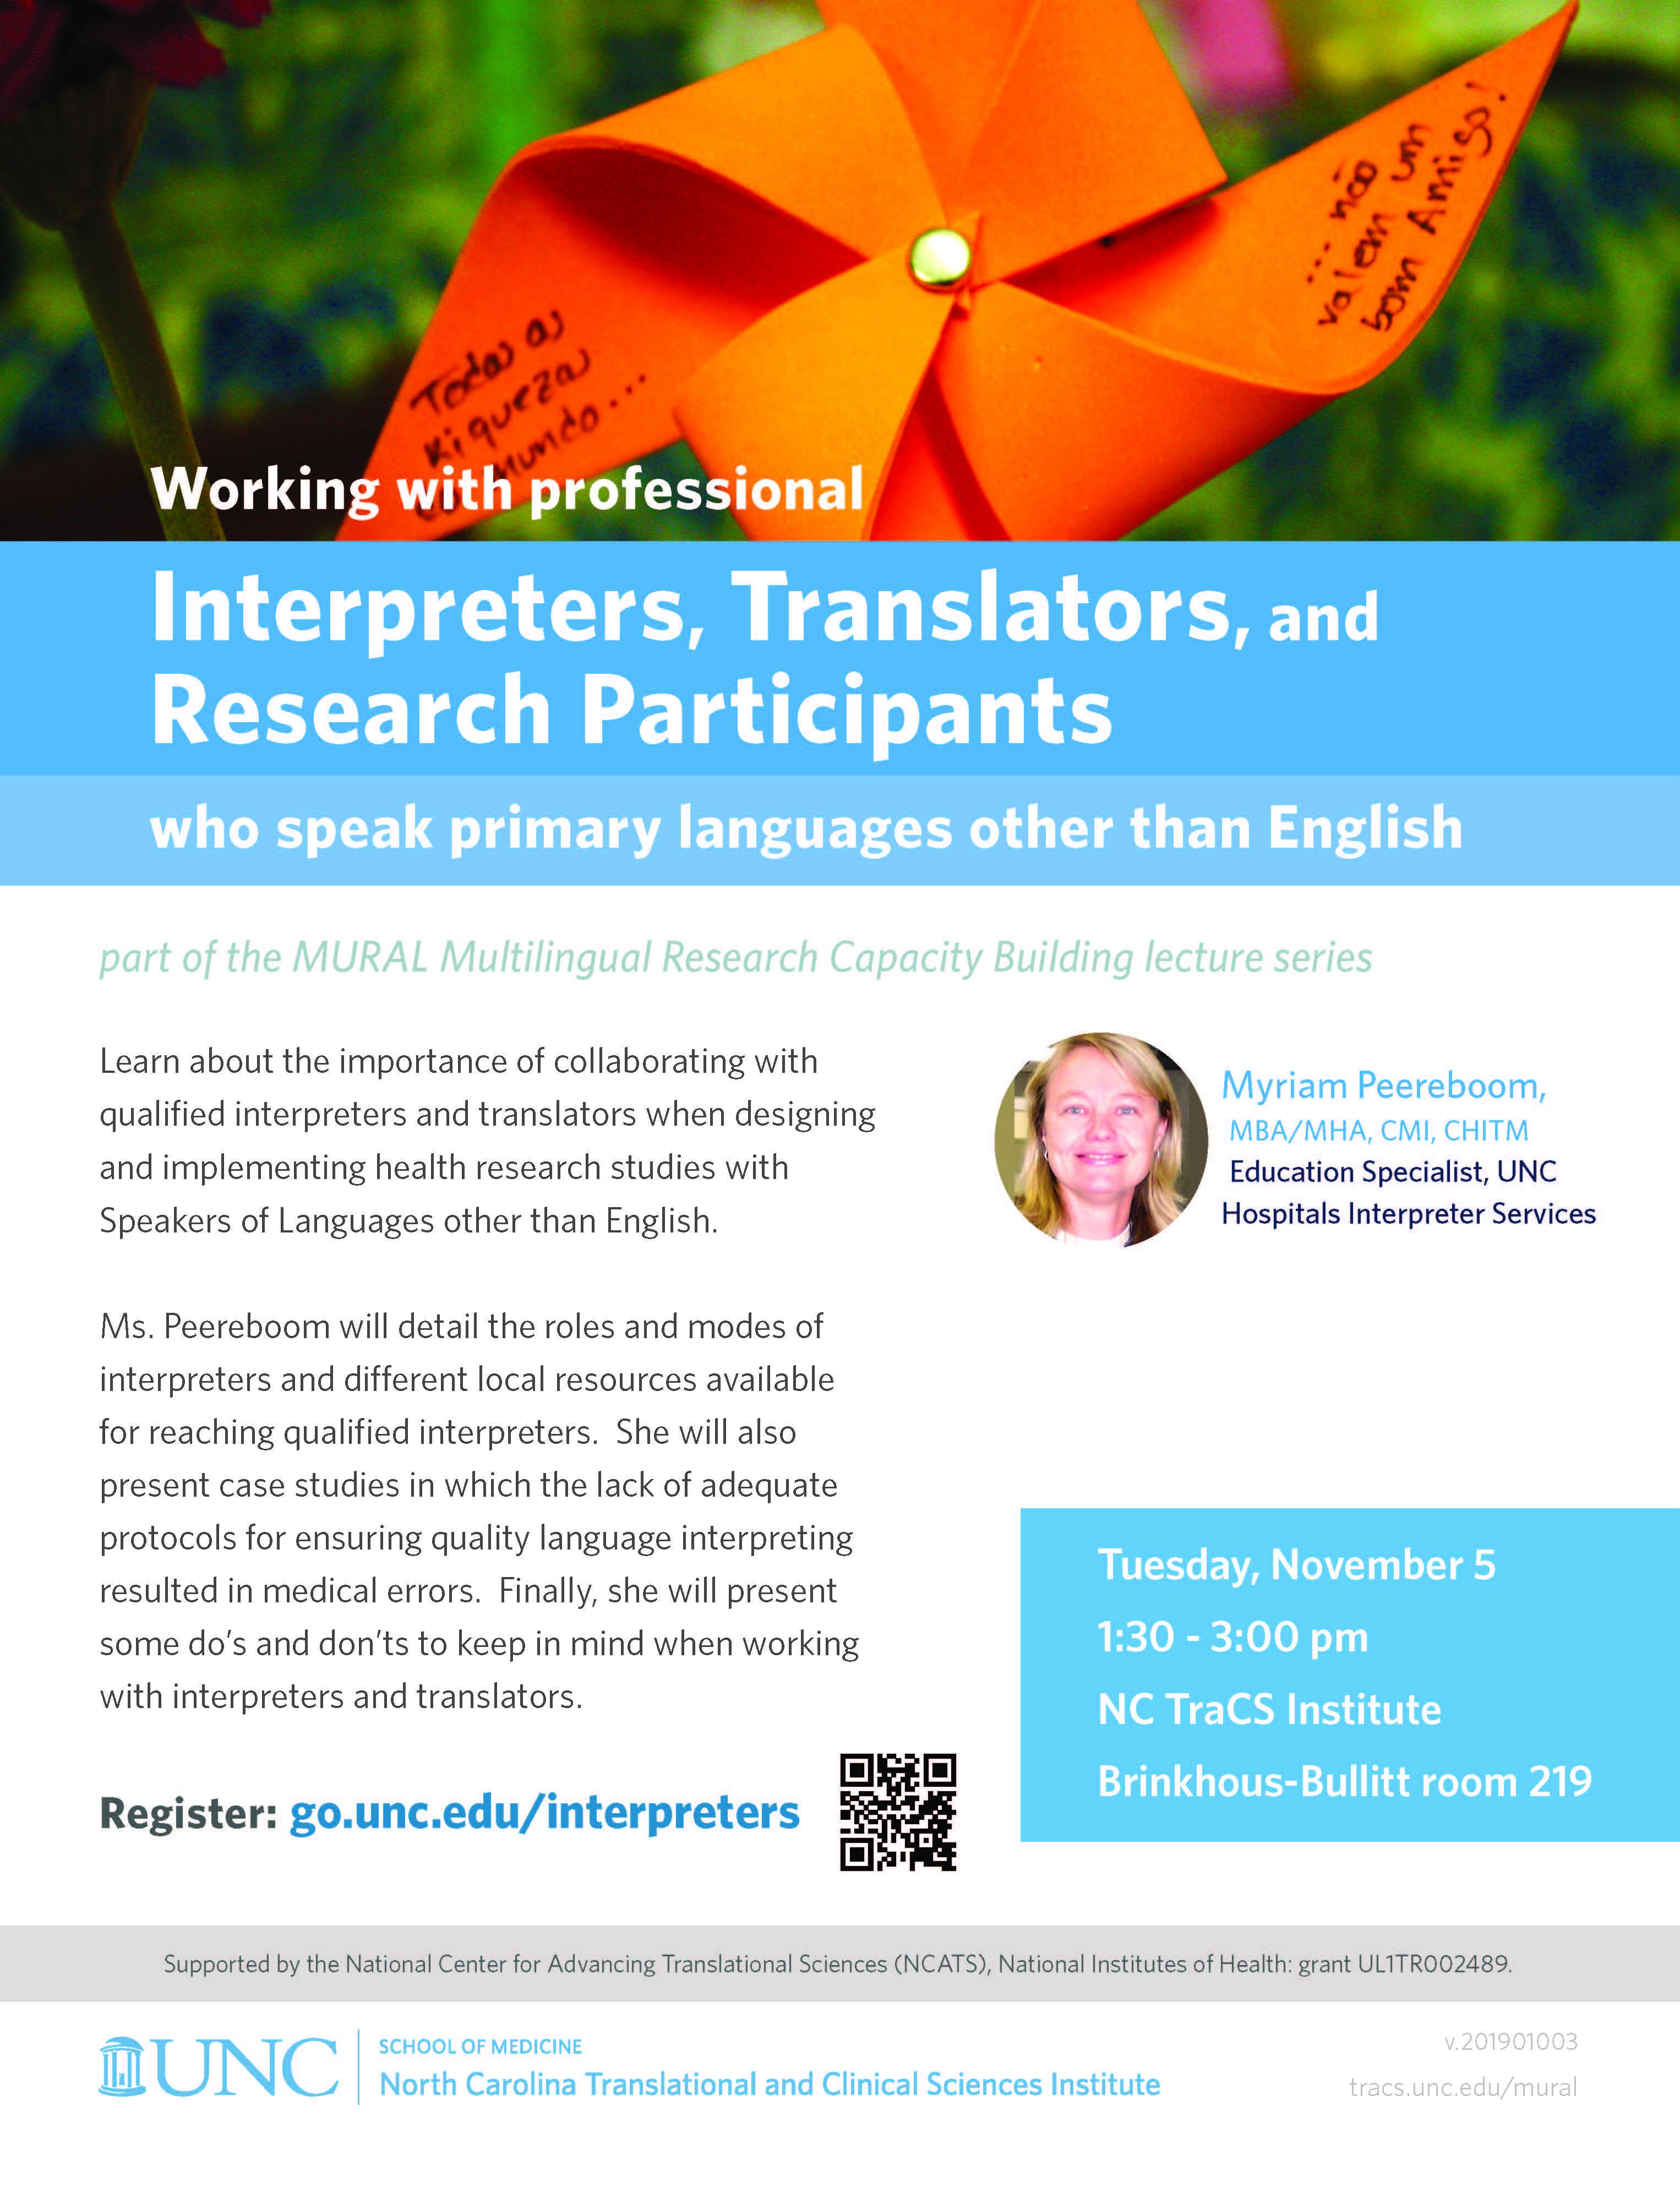 MURAL Multilingual Research Capacity Building Lecture Series: Interpreters, Translators, and Research Participants